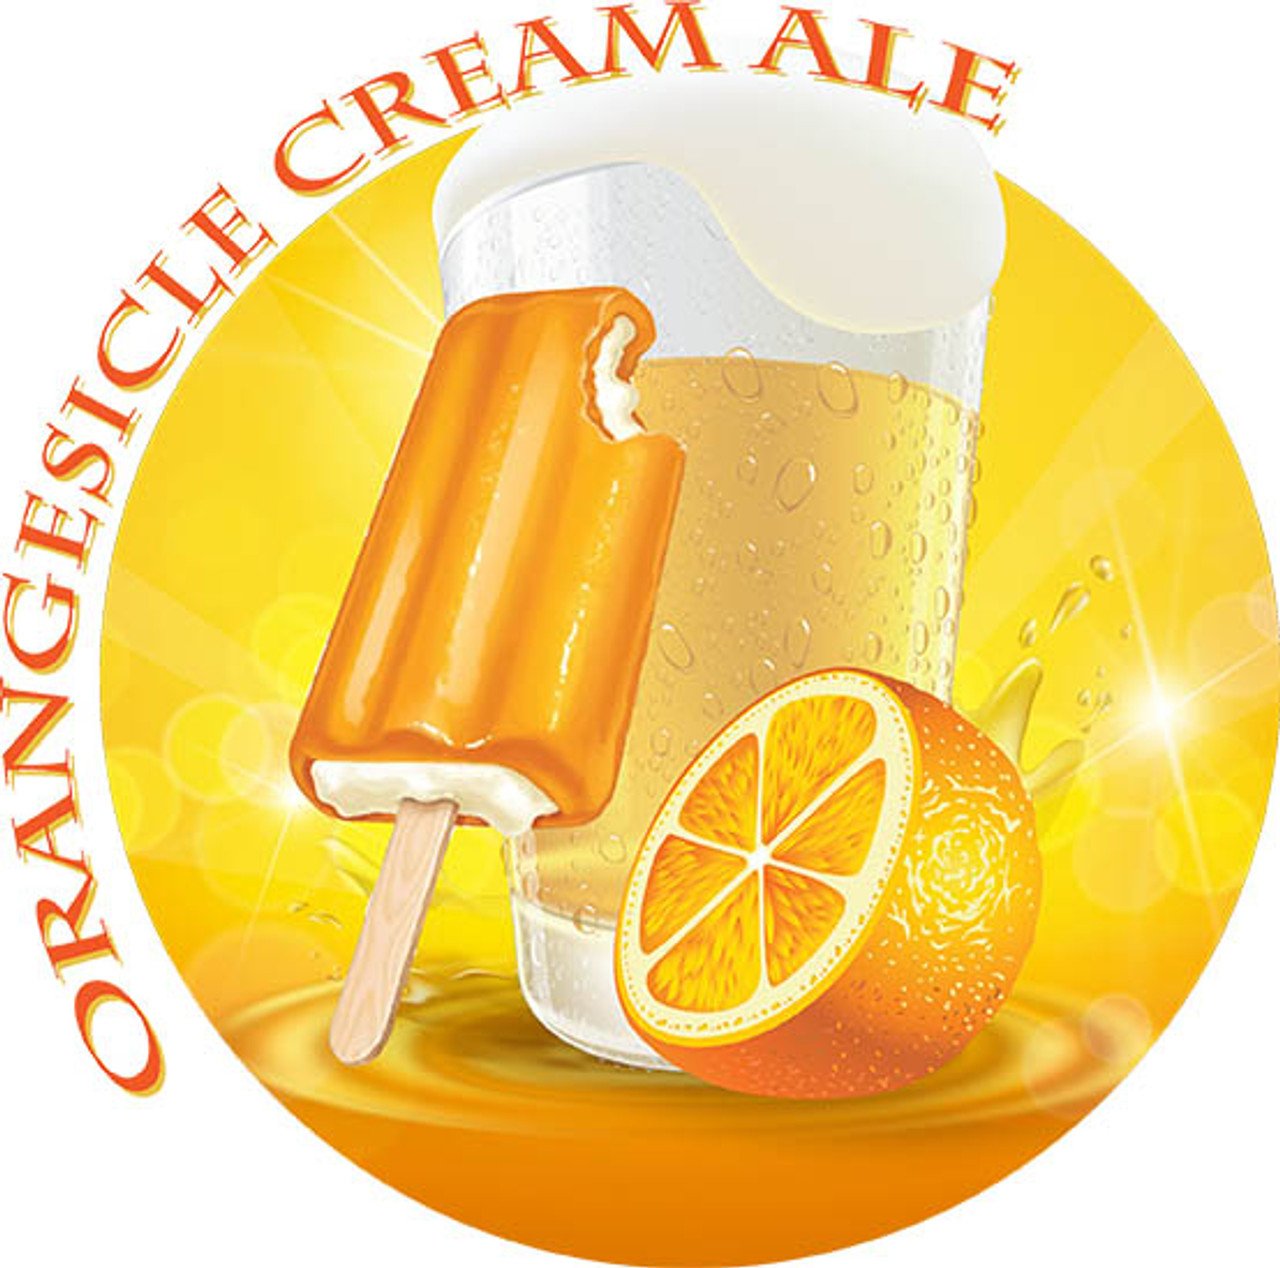 Orangesicle Cream Ale Ingredient Package (Limited)